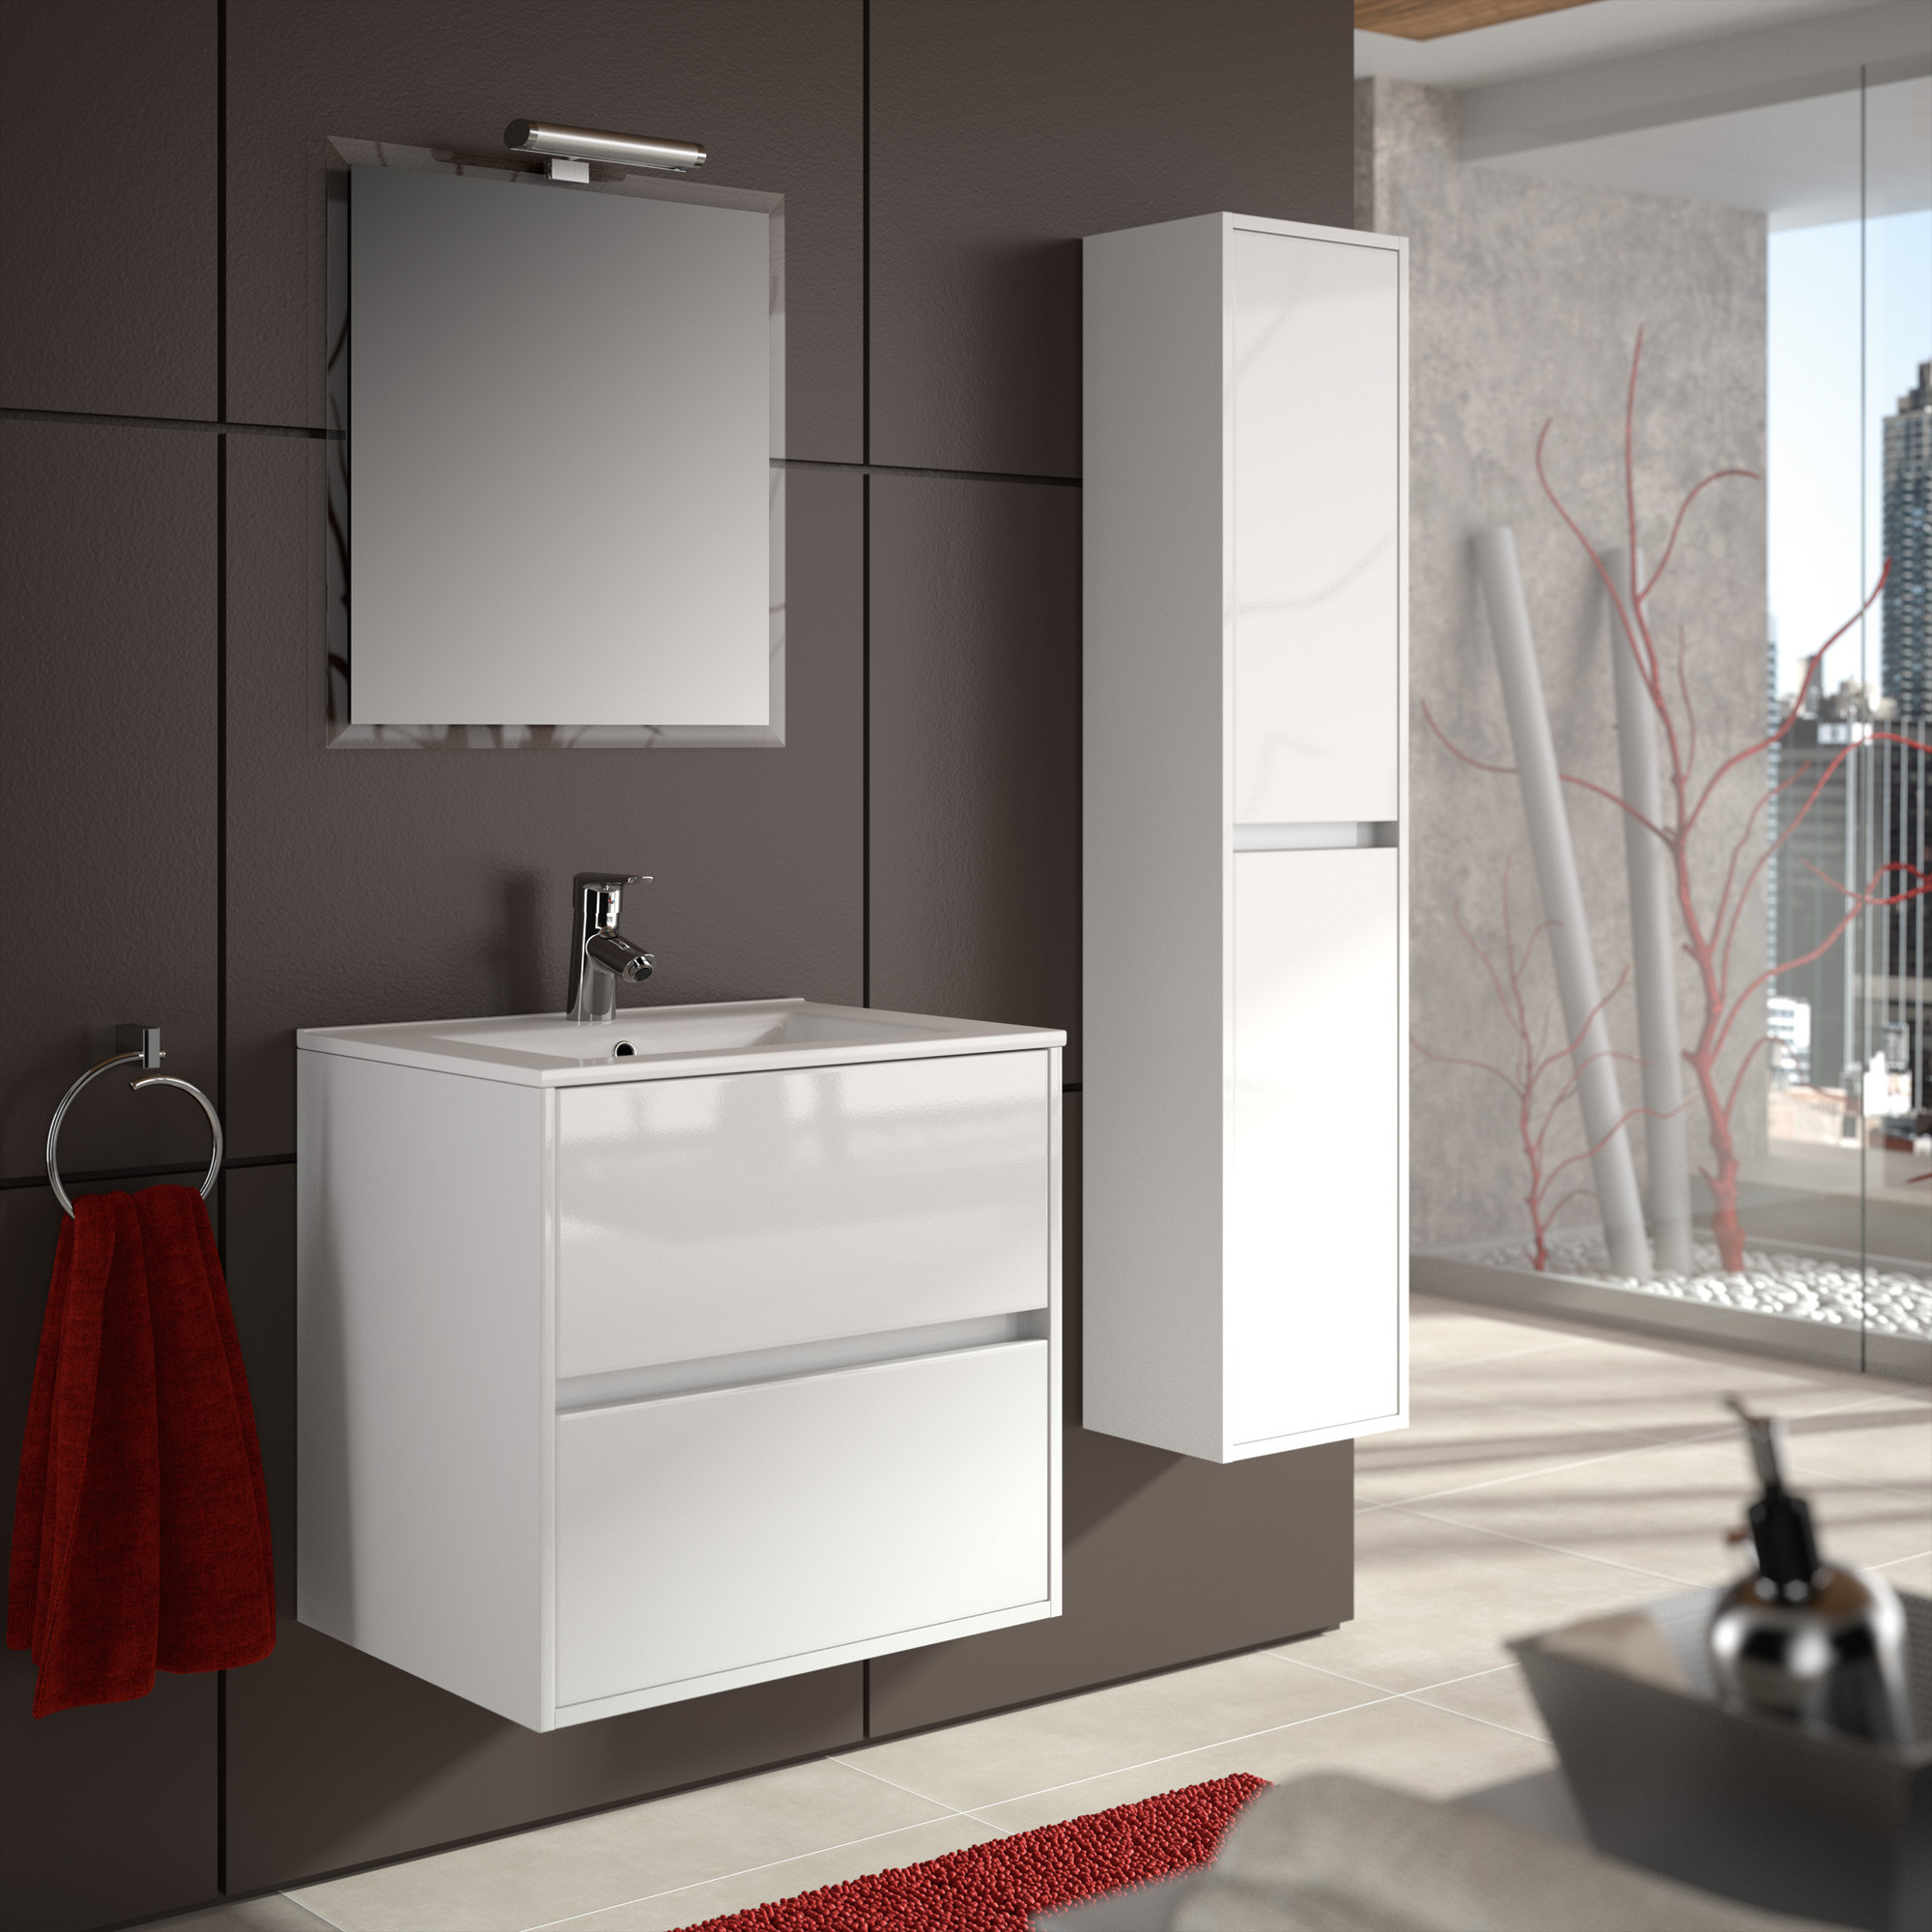 Meuble salle de bain bois blanc Salle de bains blanc